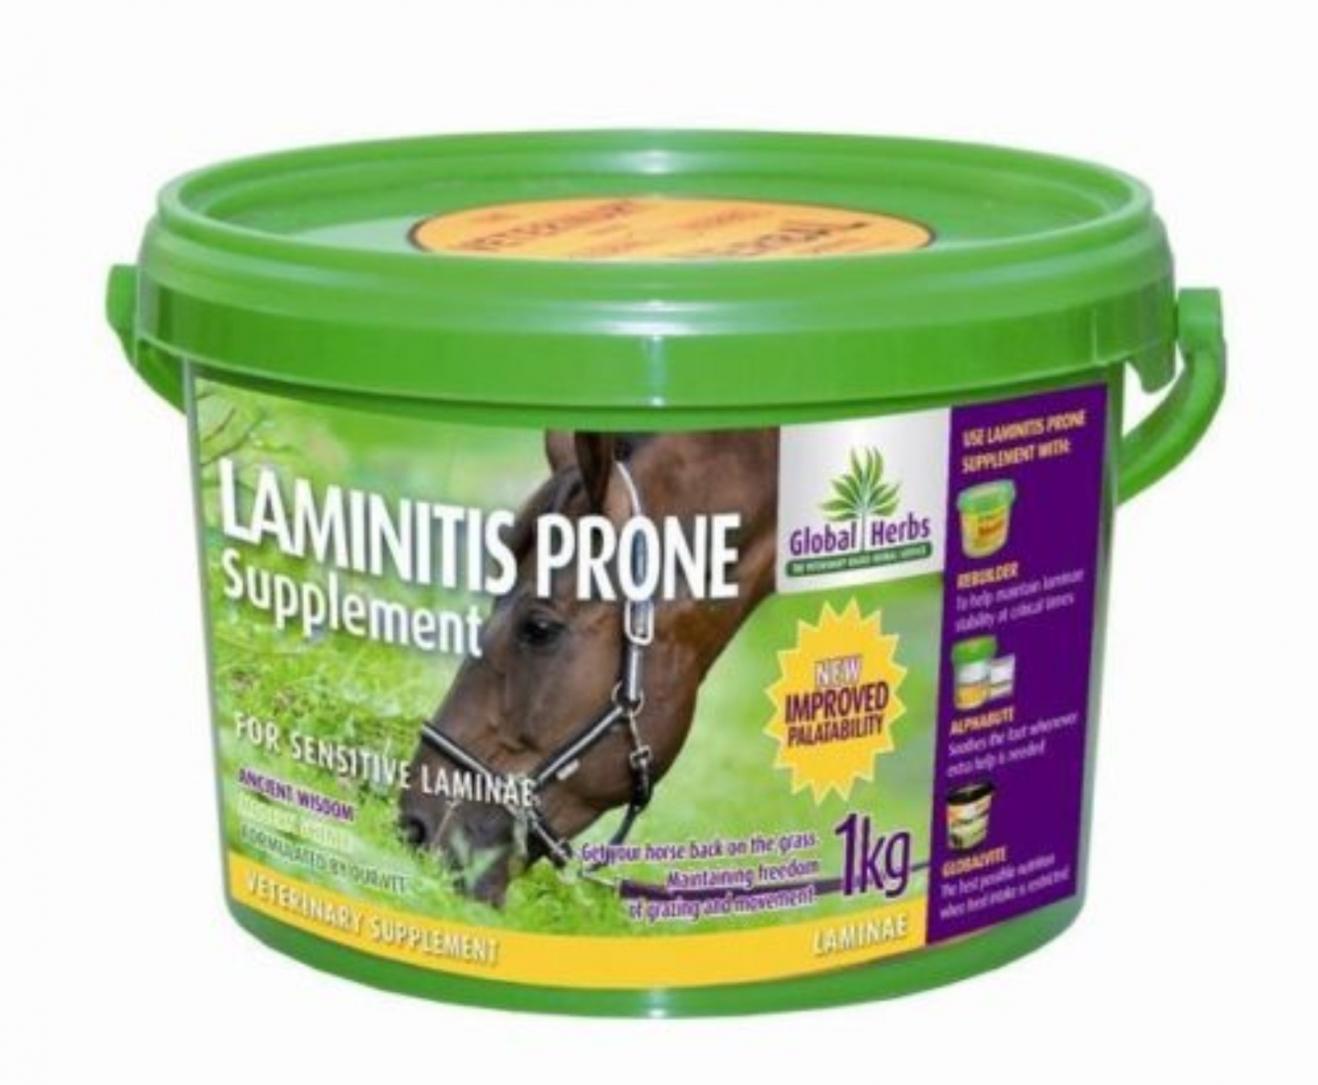 Global Herbs Laminitis Prone Supplement 1Kg